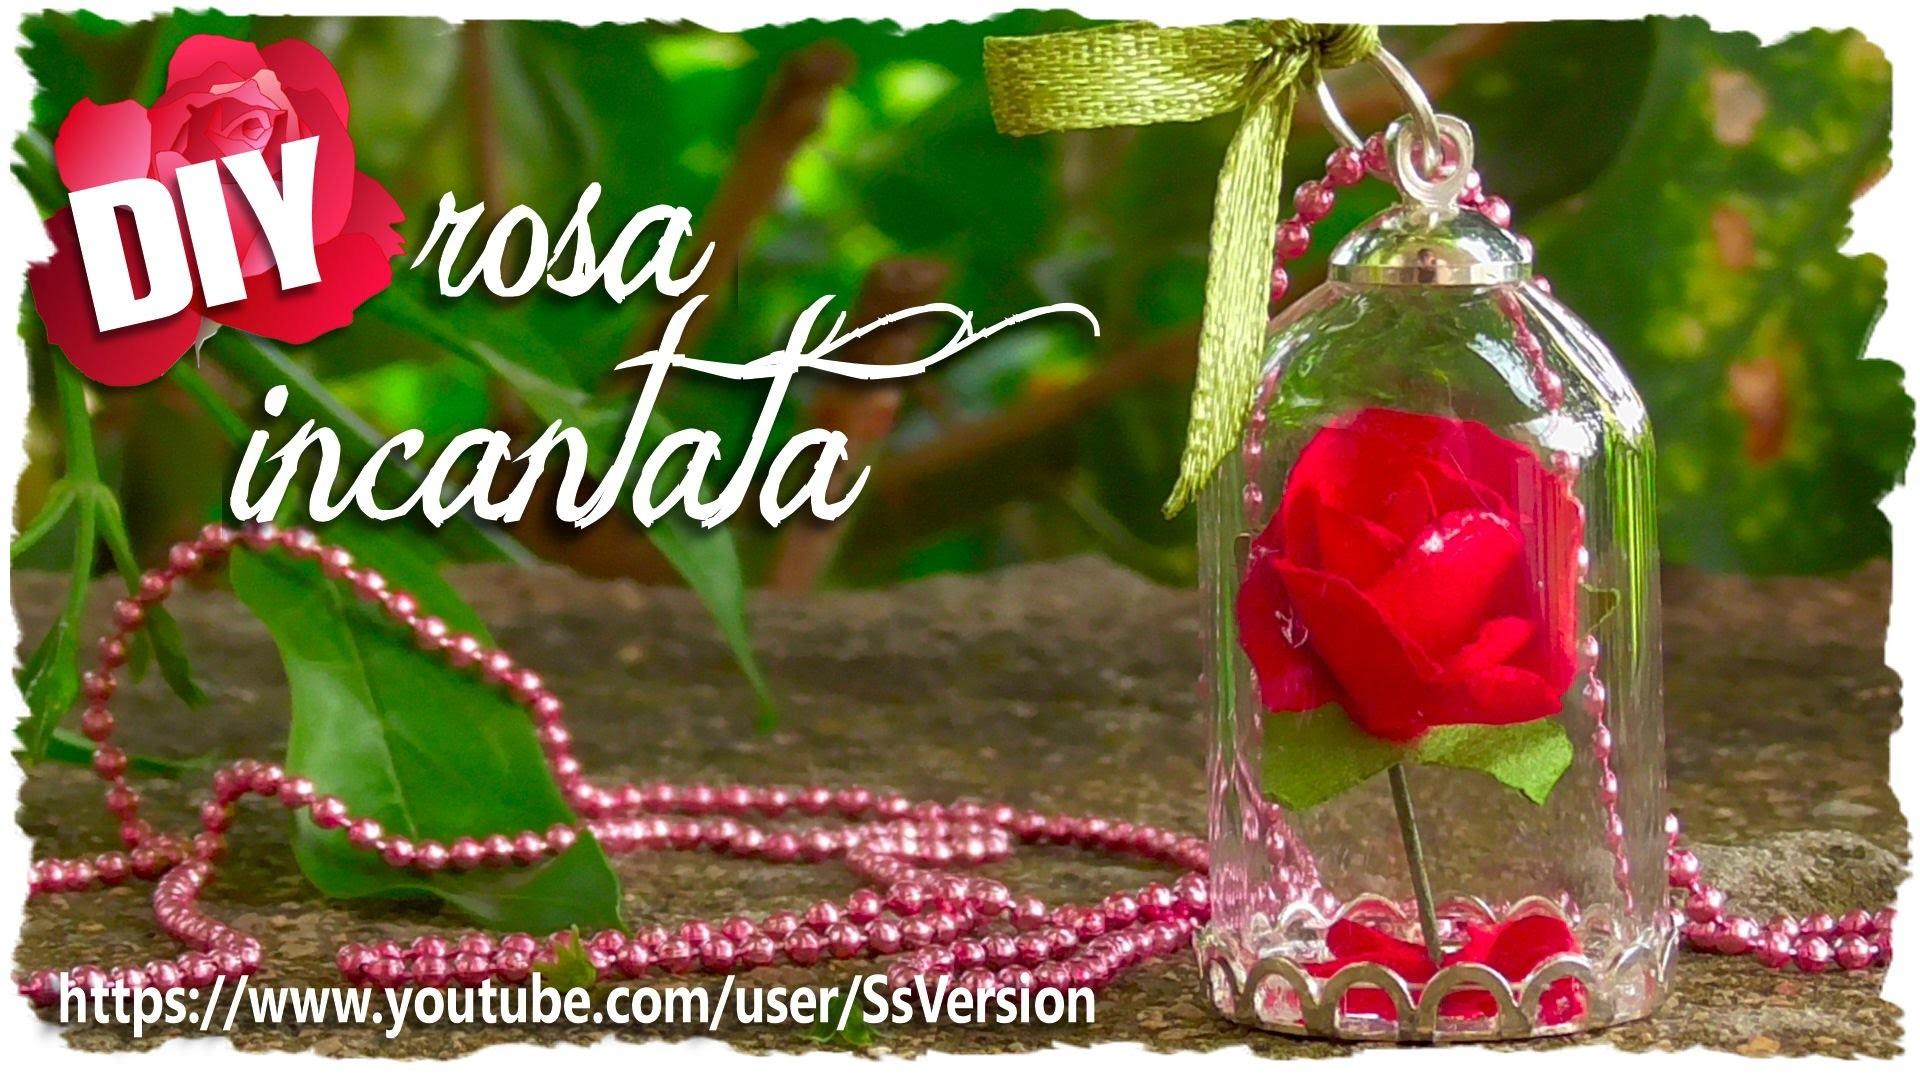 Tutorial: Rosa Incantata | DIY Miniature Enchanted Rose ♥ the Beauty and the Beast